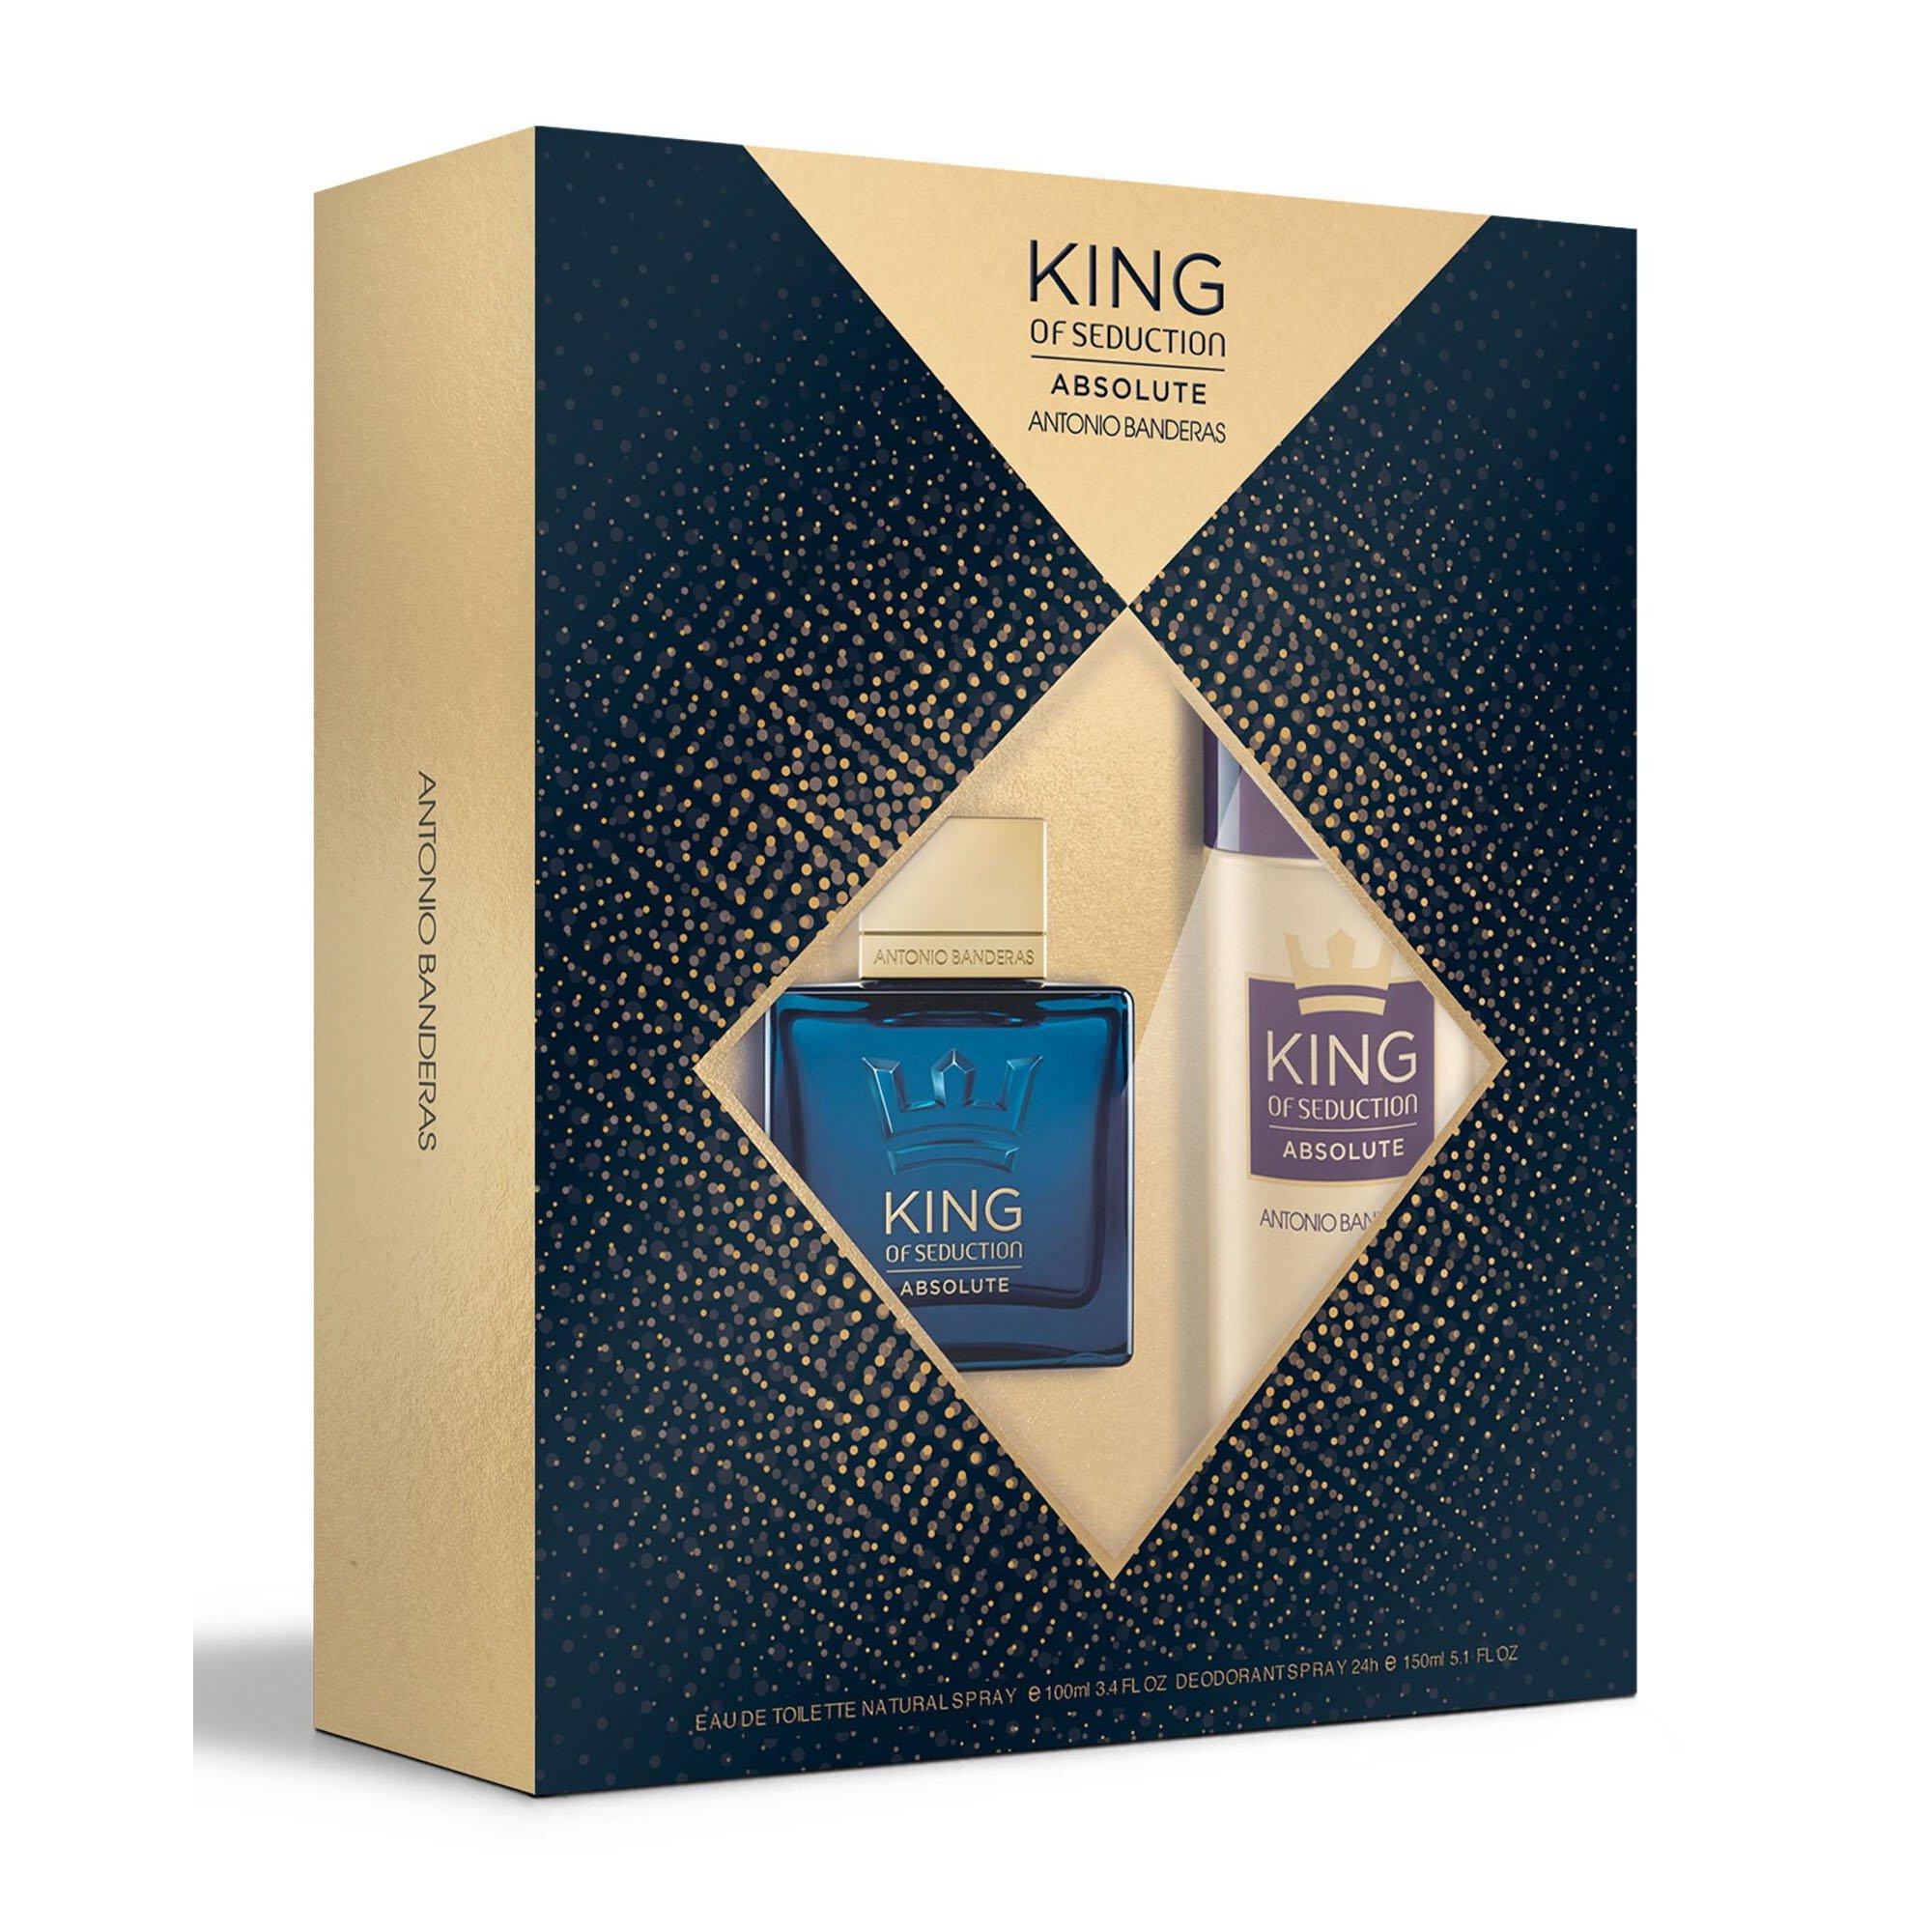 perfume antonio banderas king of seduction absolute kit masculino edt 100 ml 50761 2000 202365 1